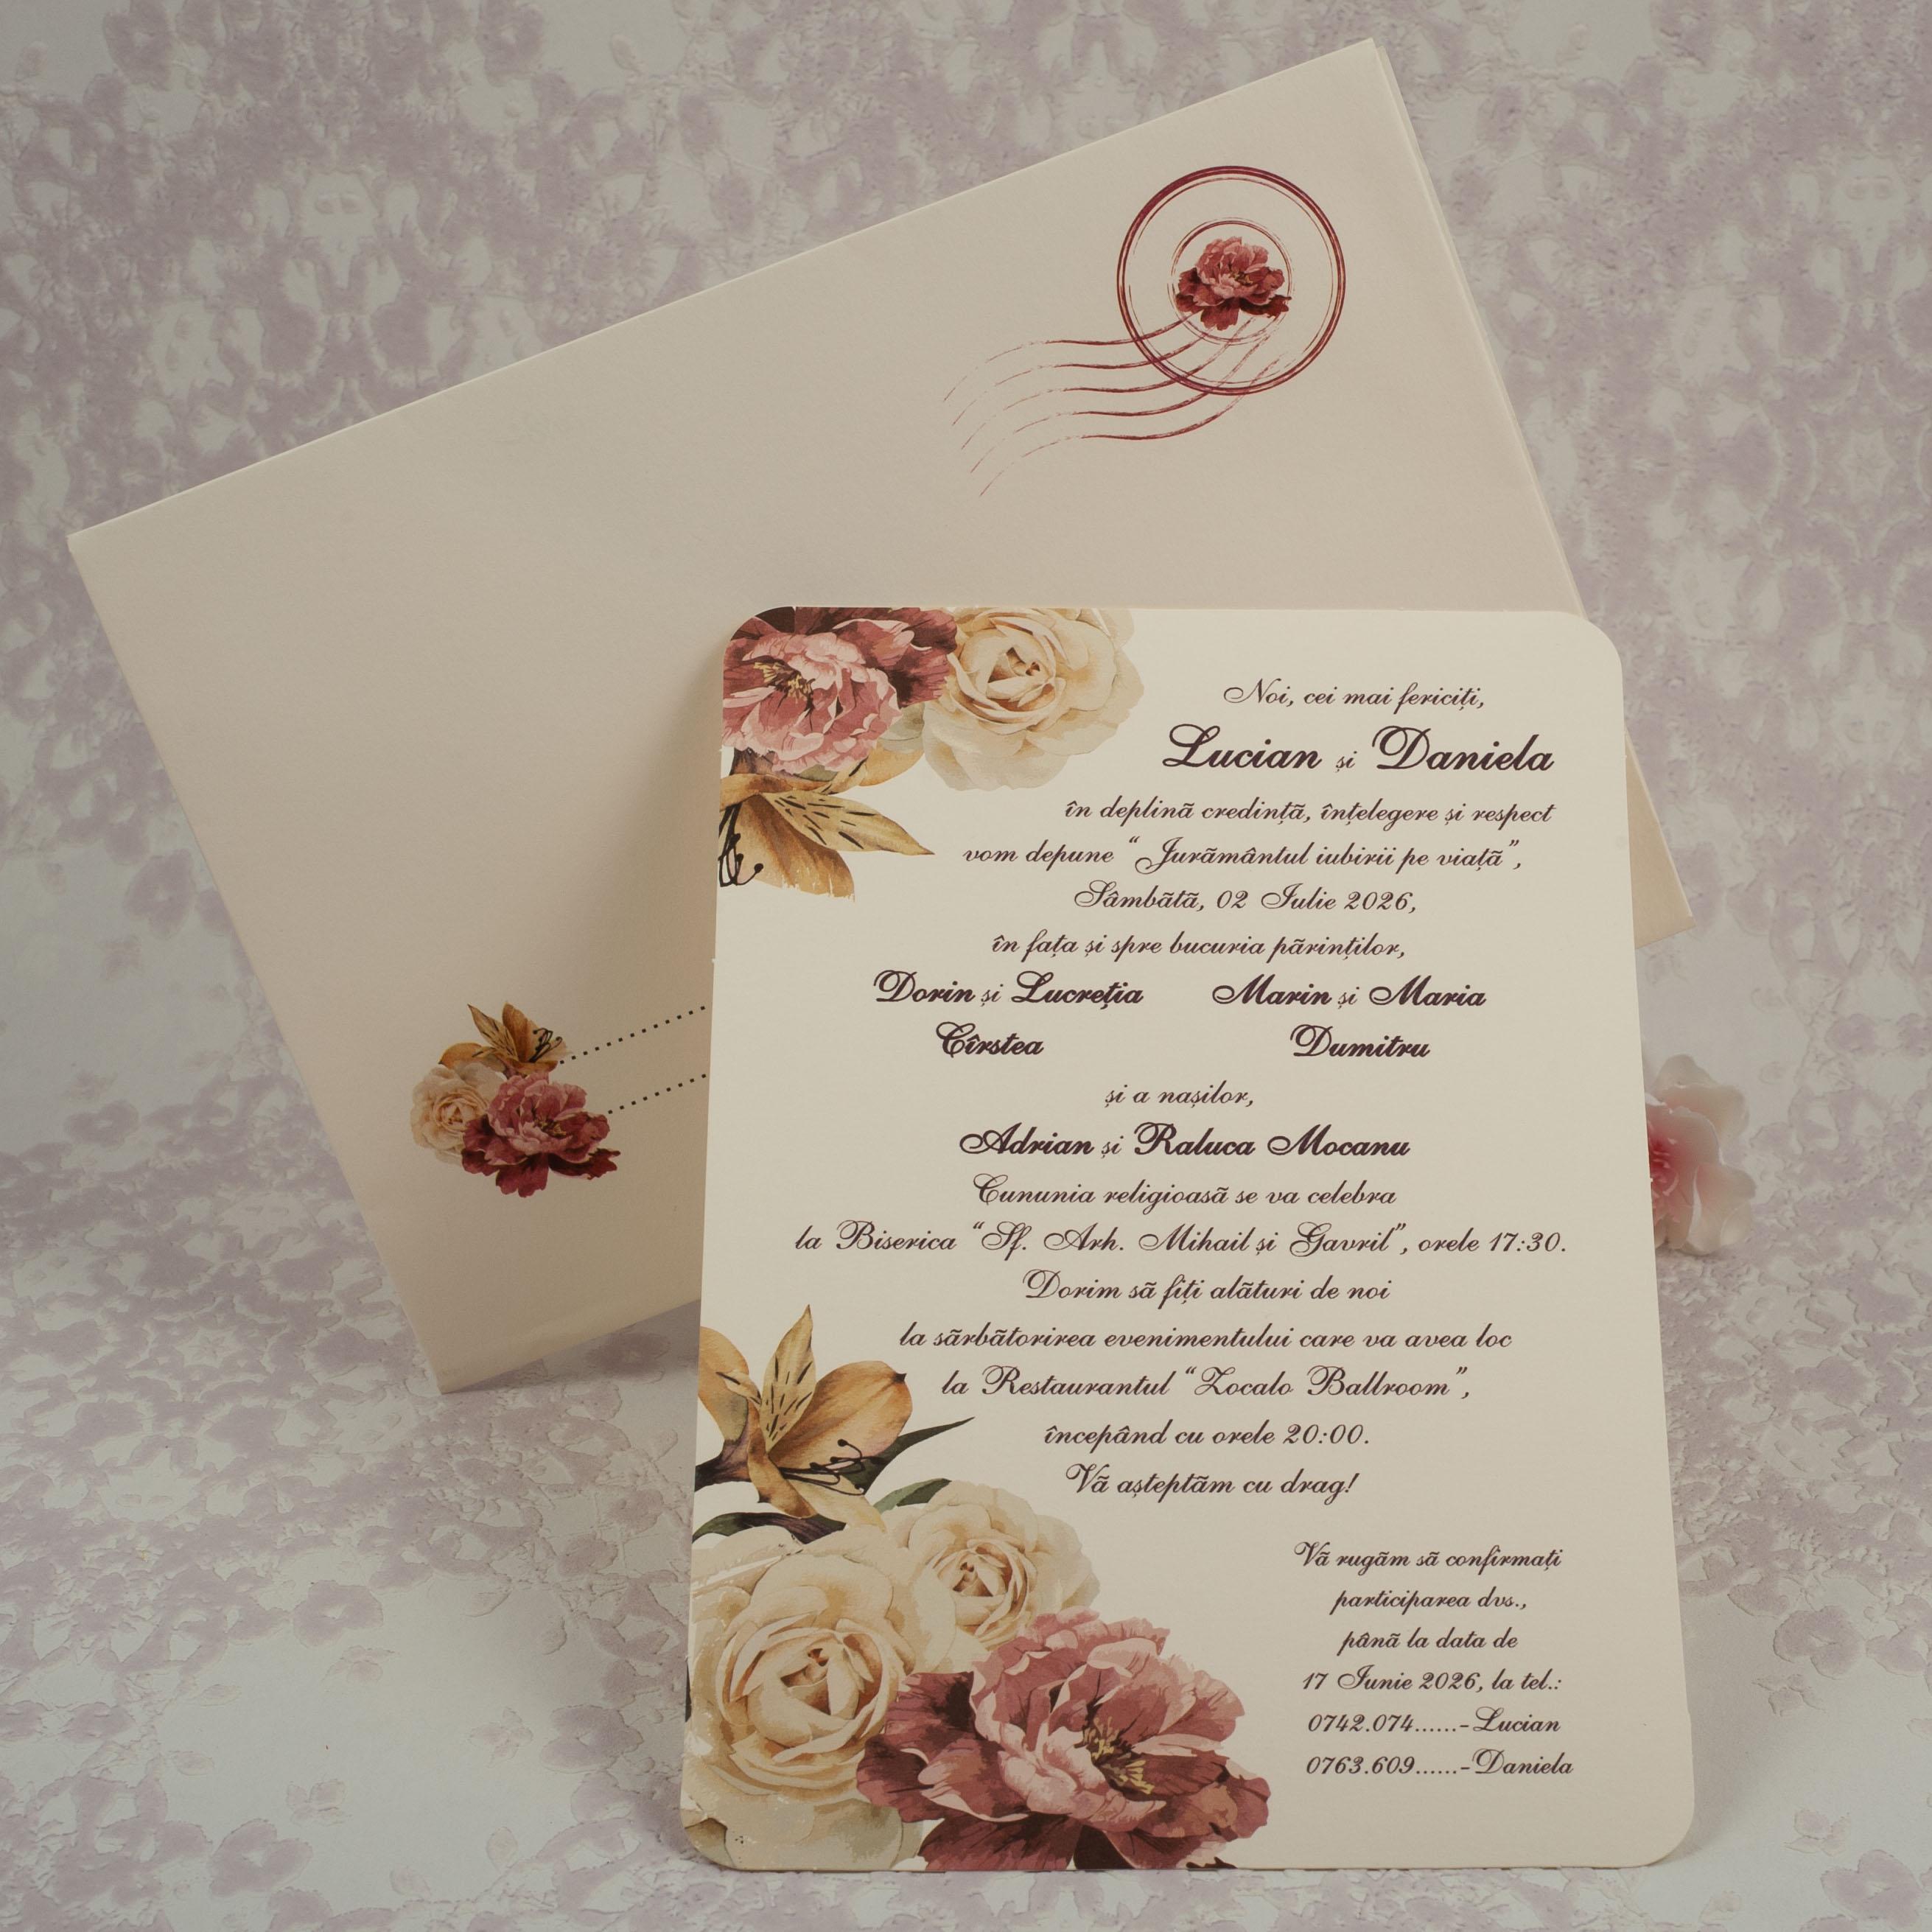 2182 Invitatii Nunta Invitatii Botez Marturii Plicuri Bani